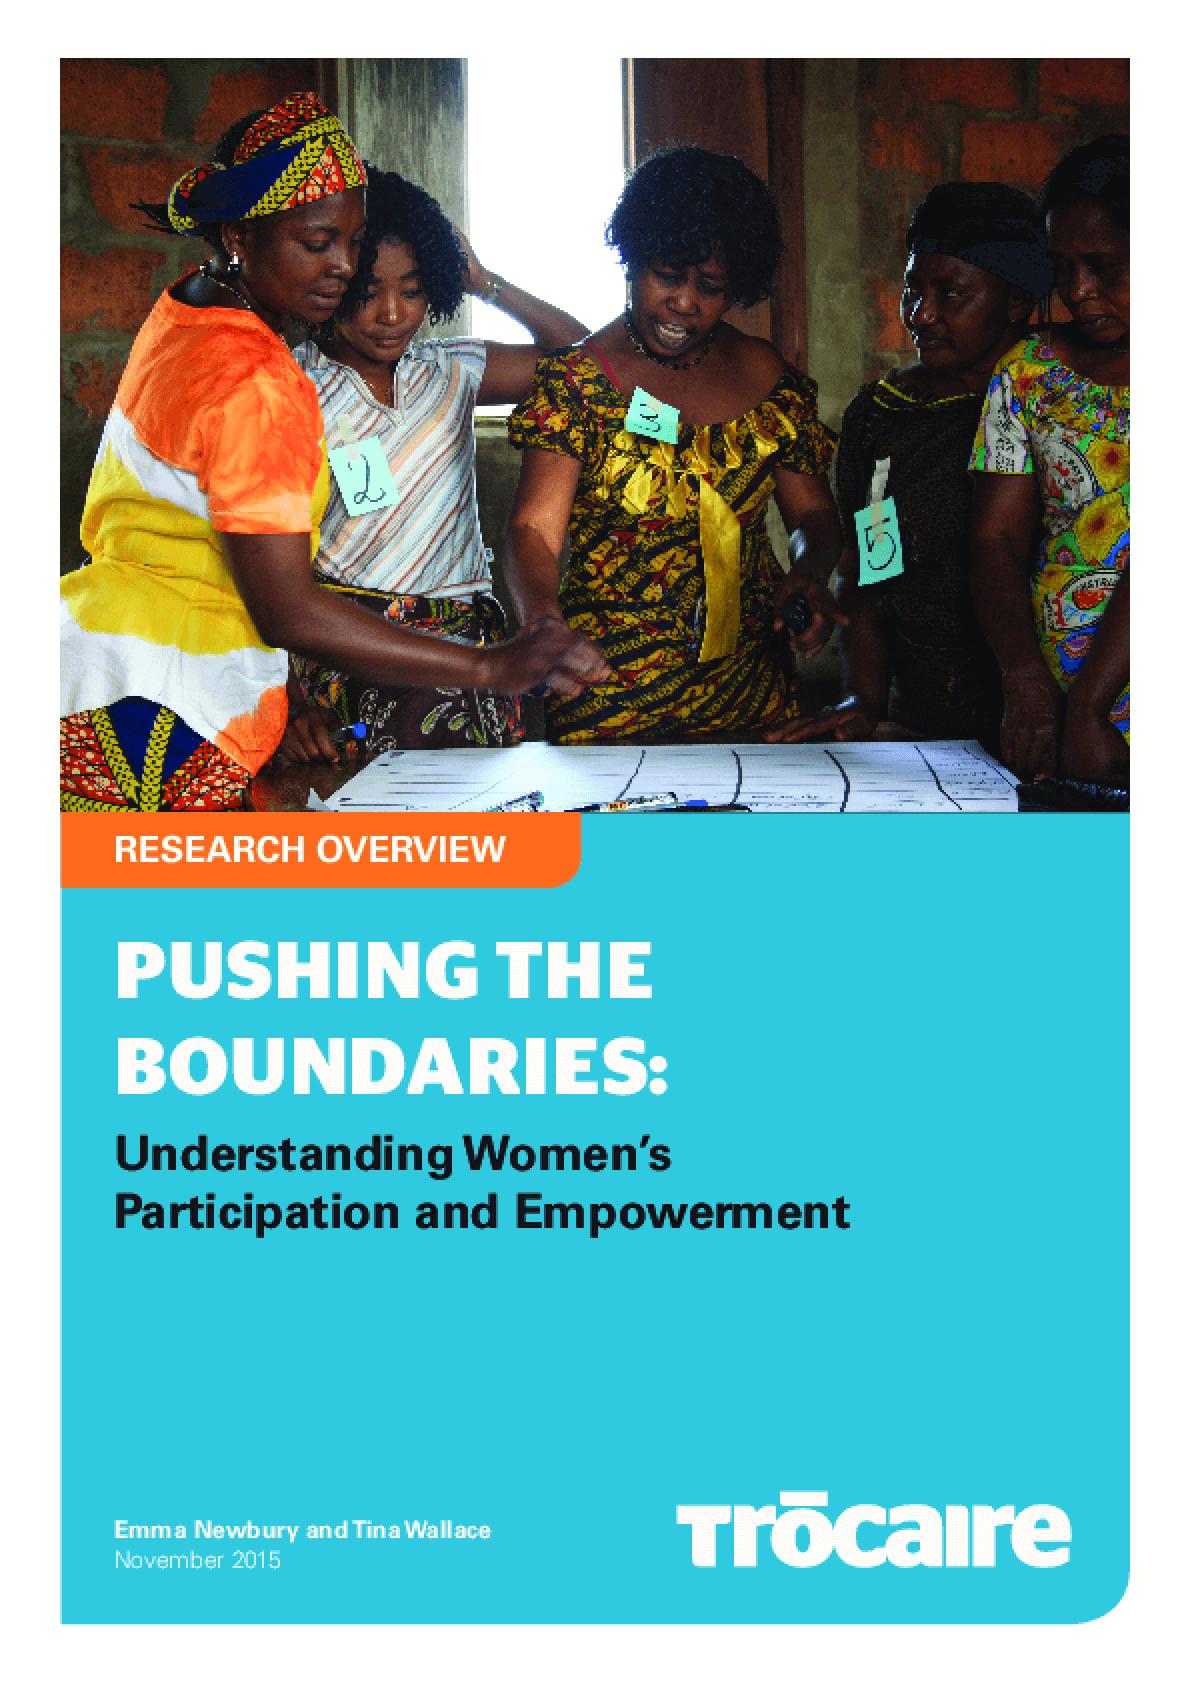 Pushing the Boundaries: Understanding Women's Participation and Empowerment